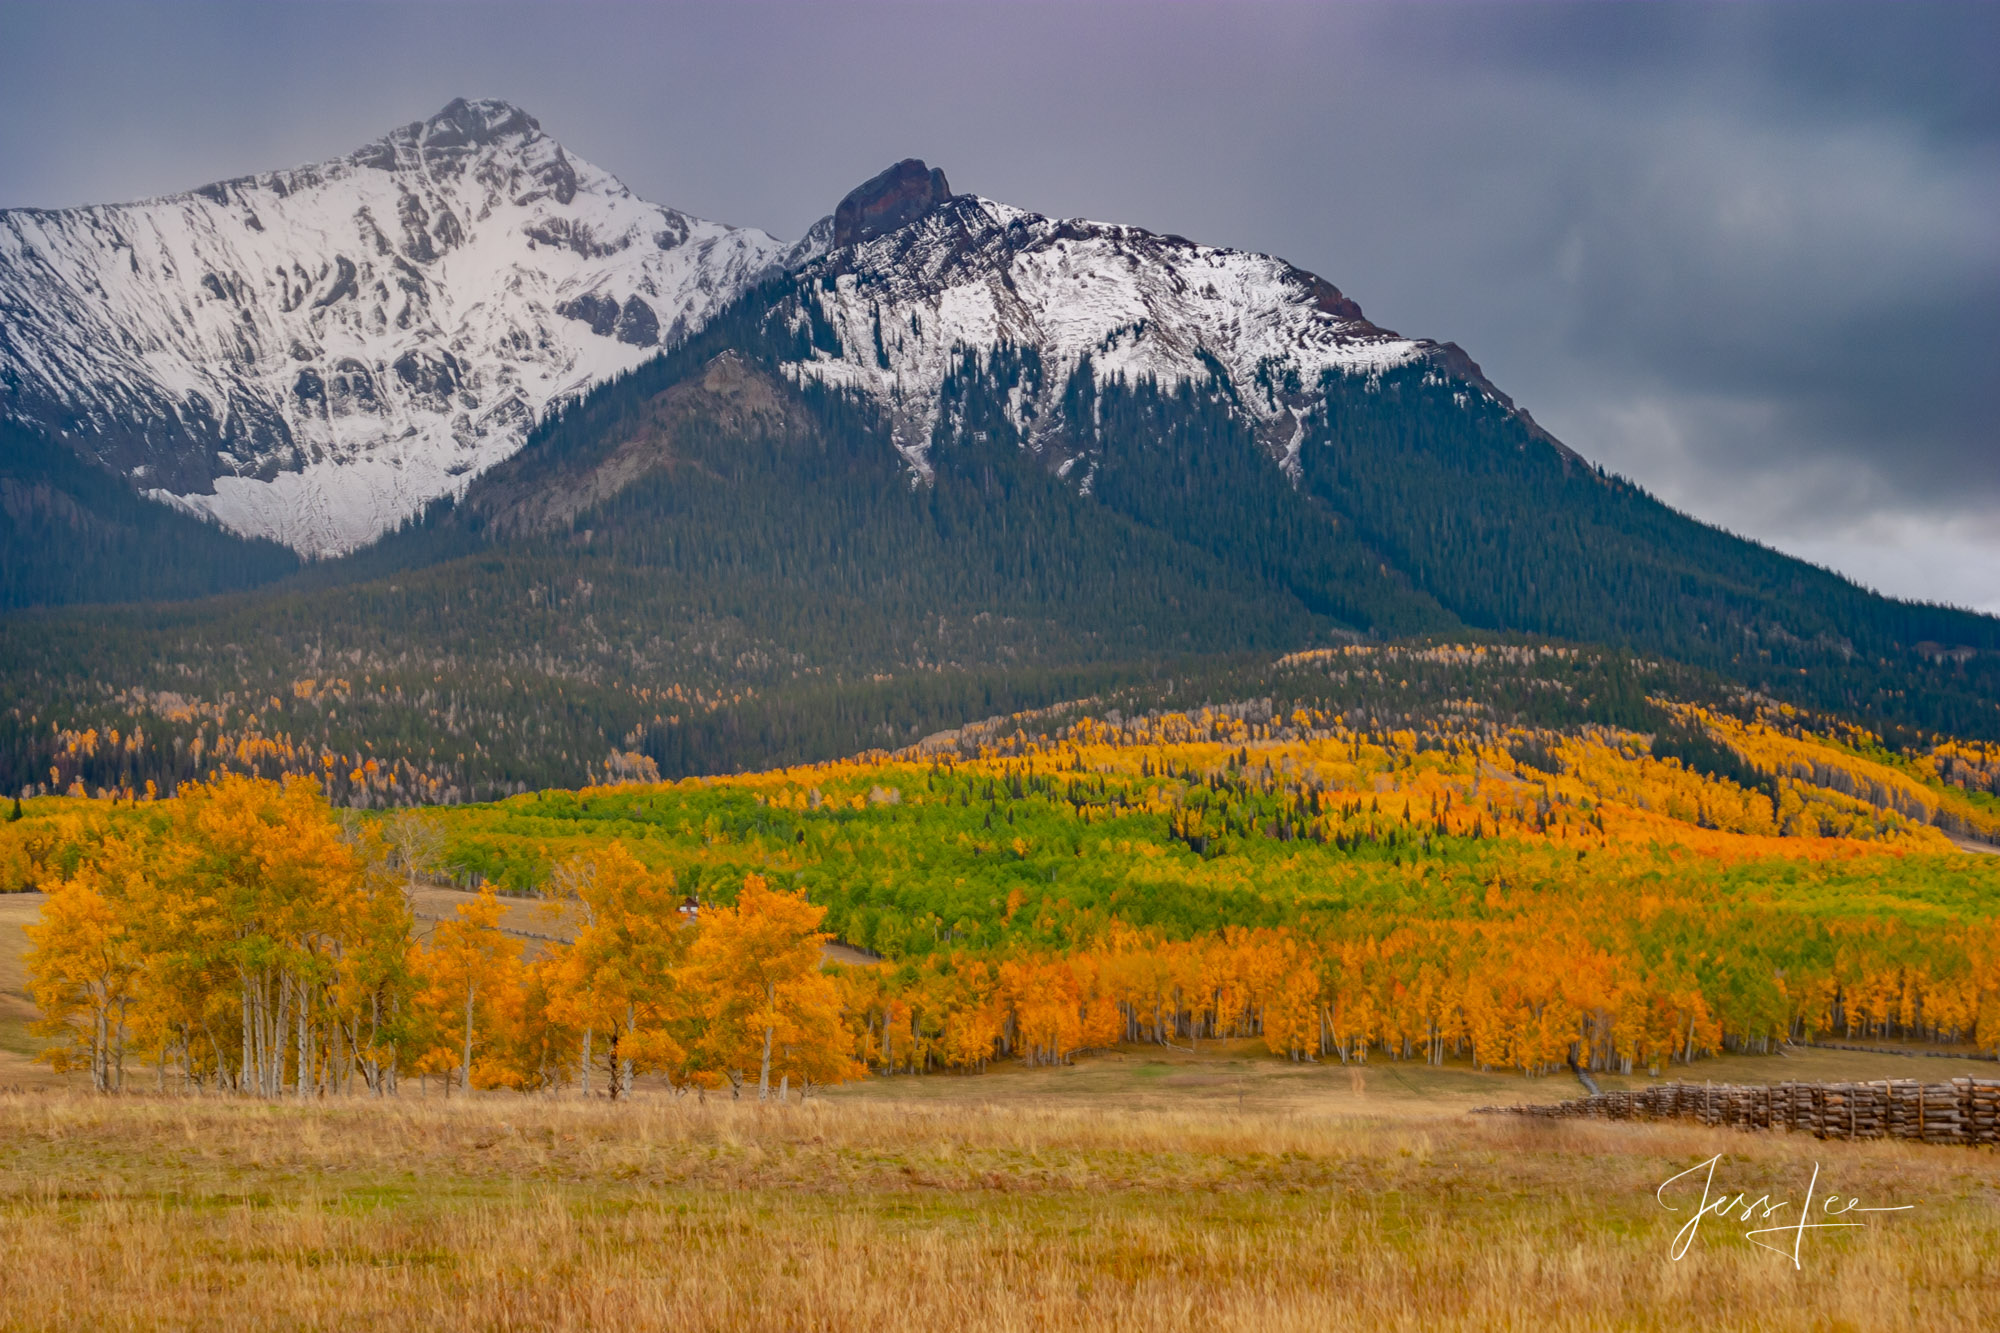 Colorado, Mountains, hill, springs, mile high, snow, trees, , photo